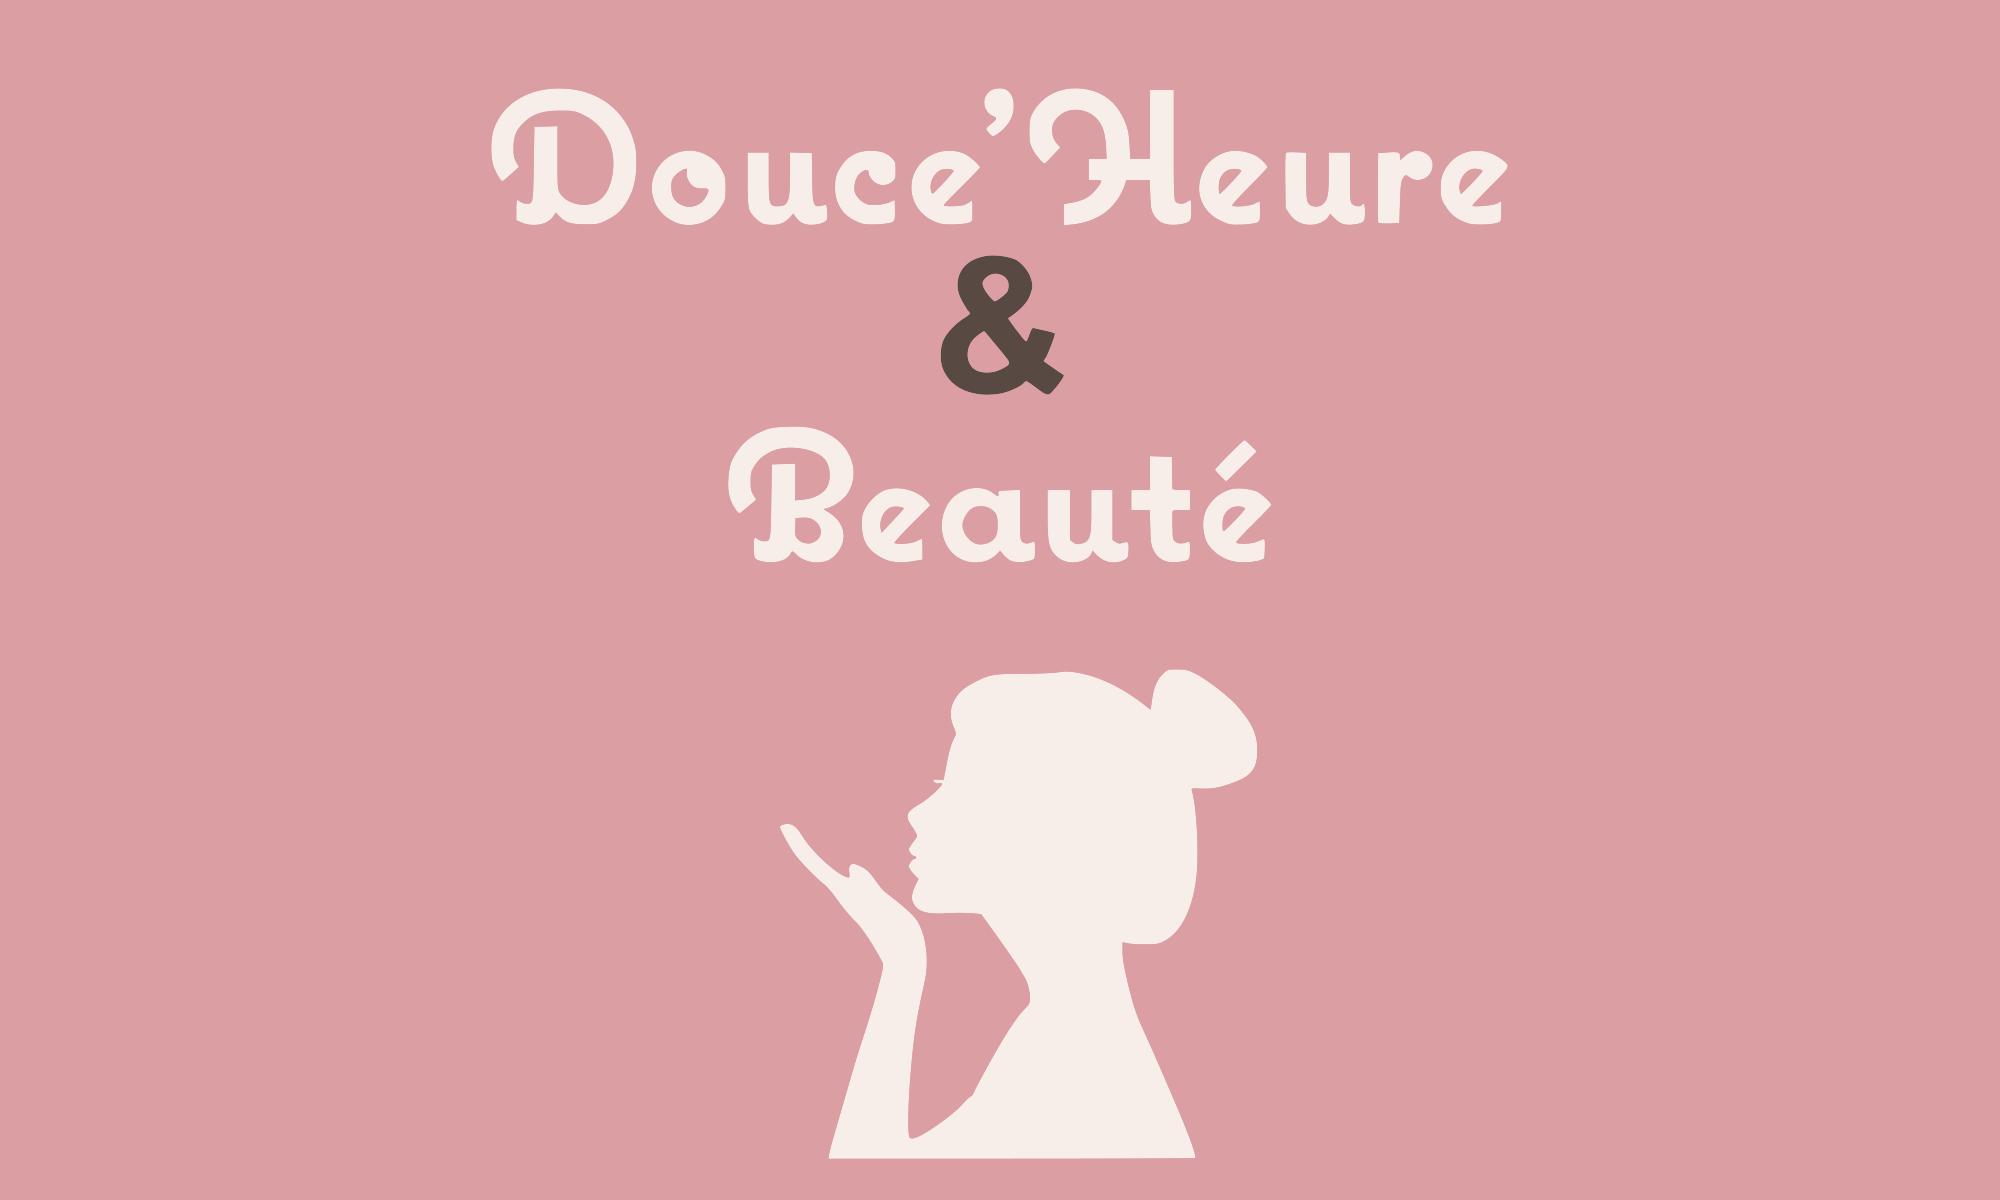 Douce'Heure & Beauté